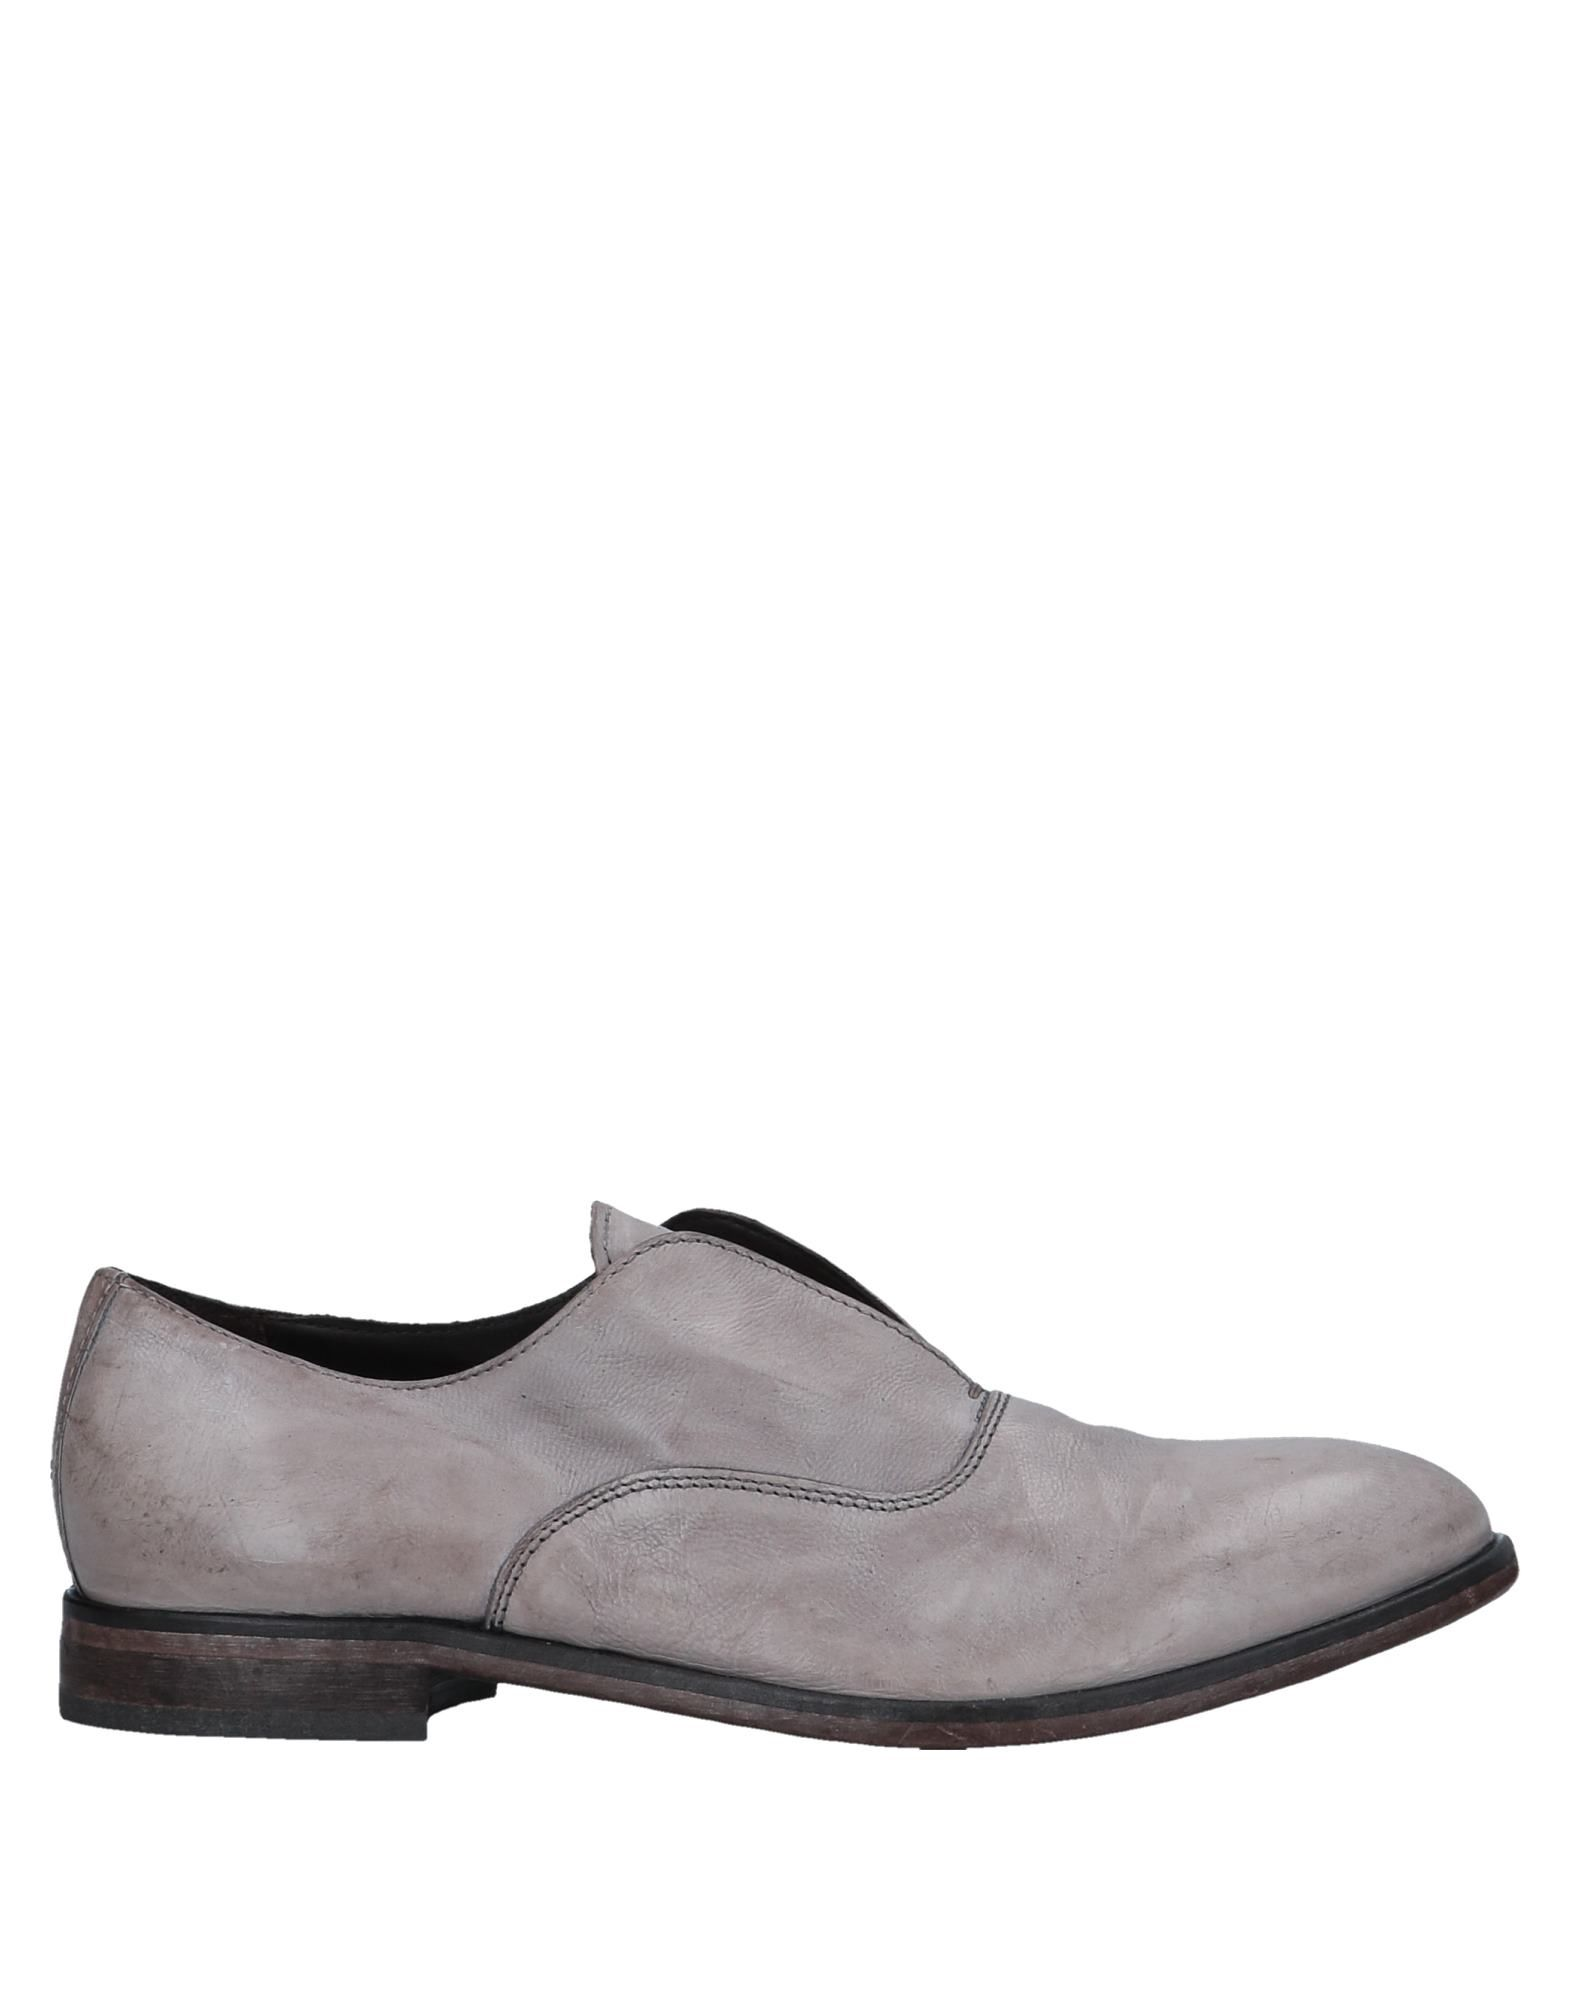 Moma Mokassins Herren  11538113BU Gute Qualität beliebte Schuhe